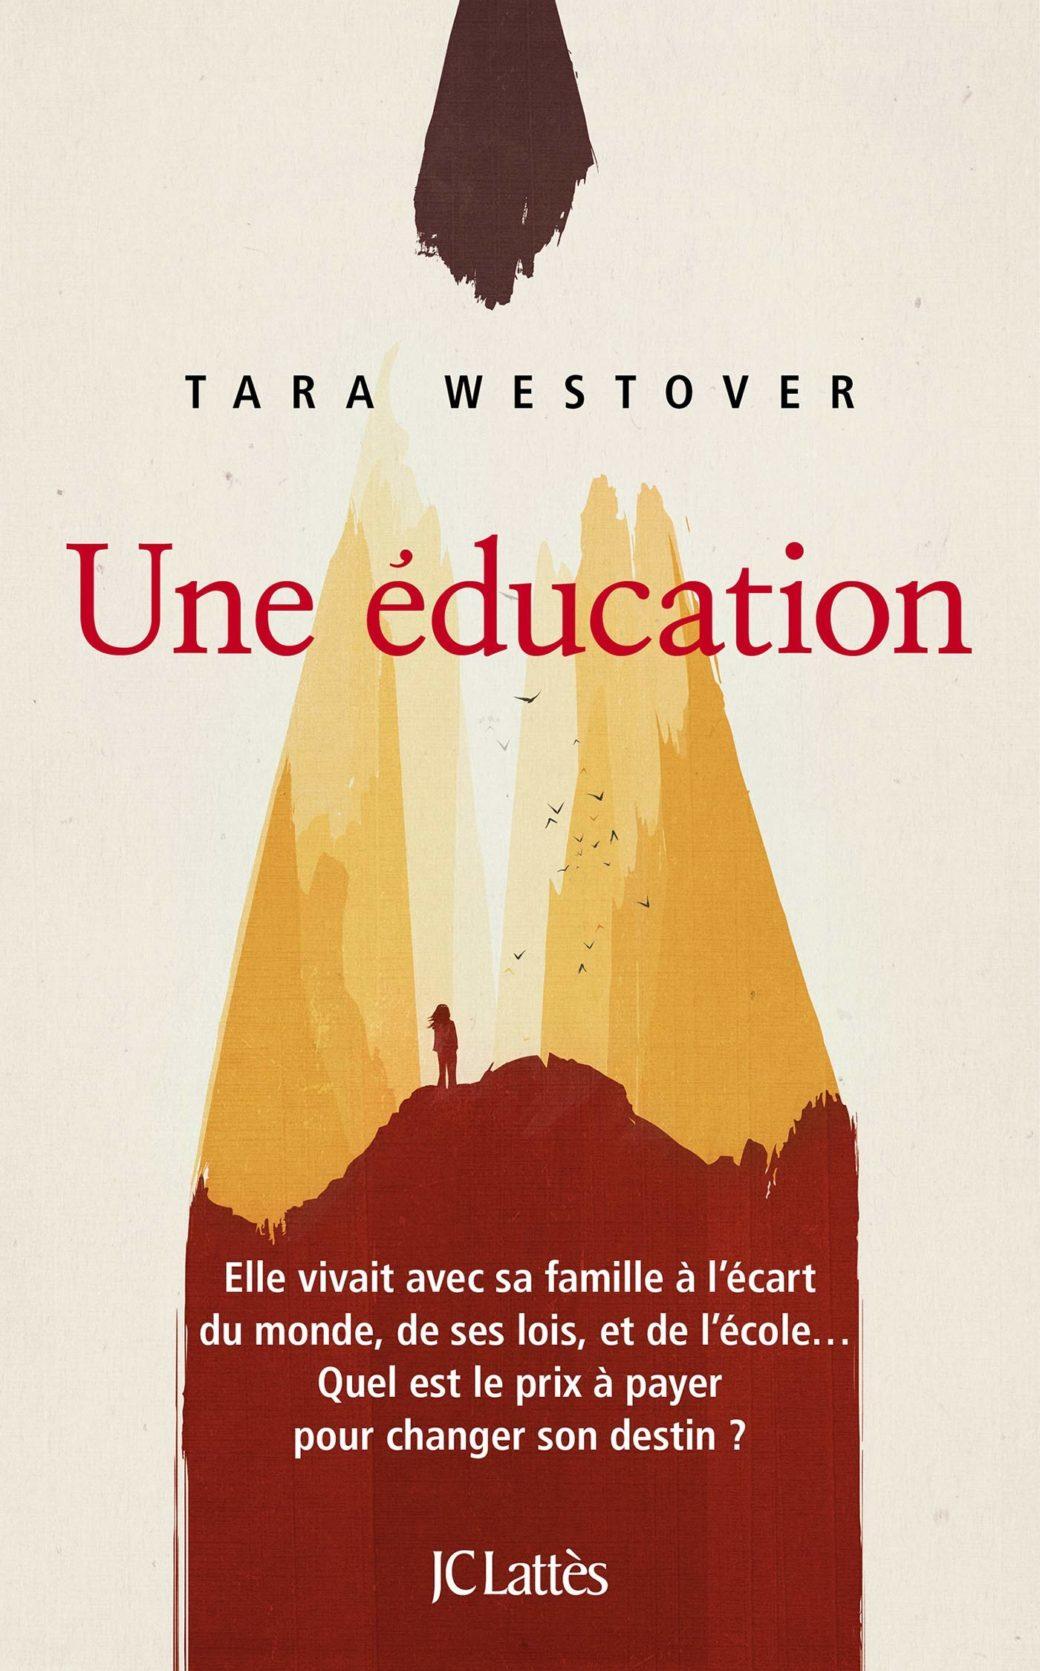 Une Education – Tara Westover | Tu vas t'abîmer les yeux